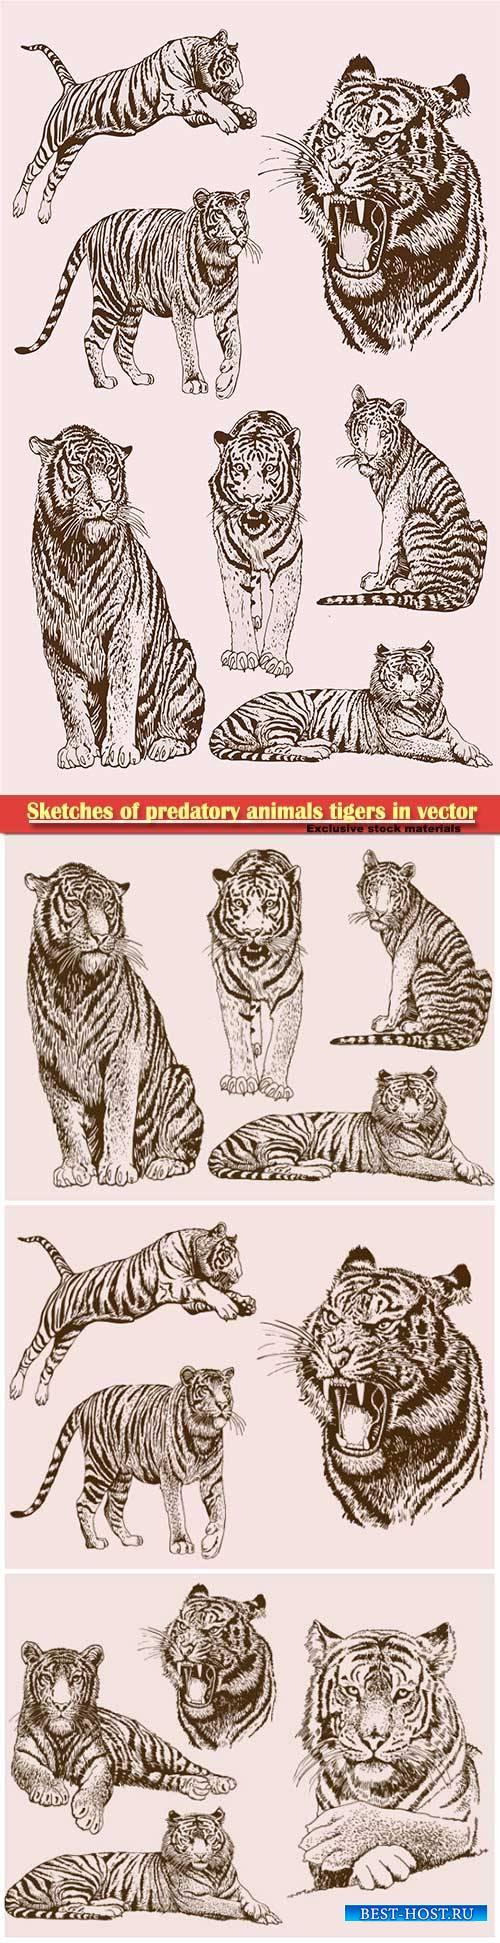 Sketches of predatory animals tigers in vector